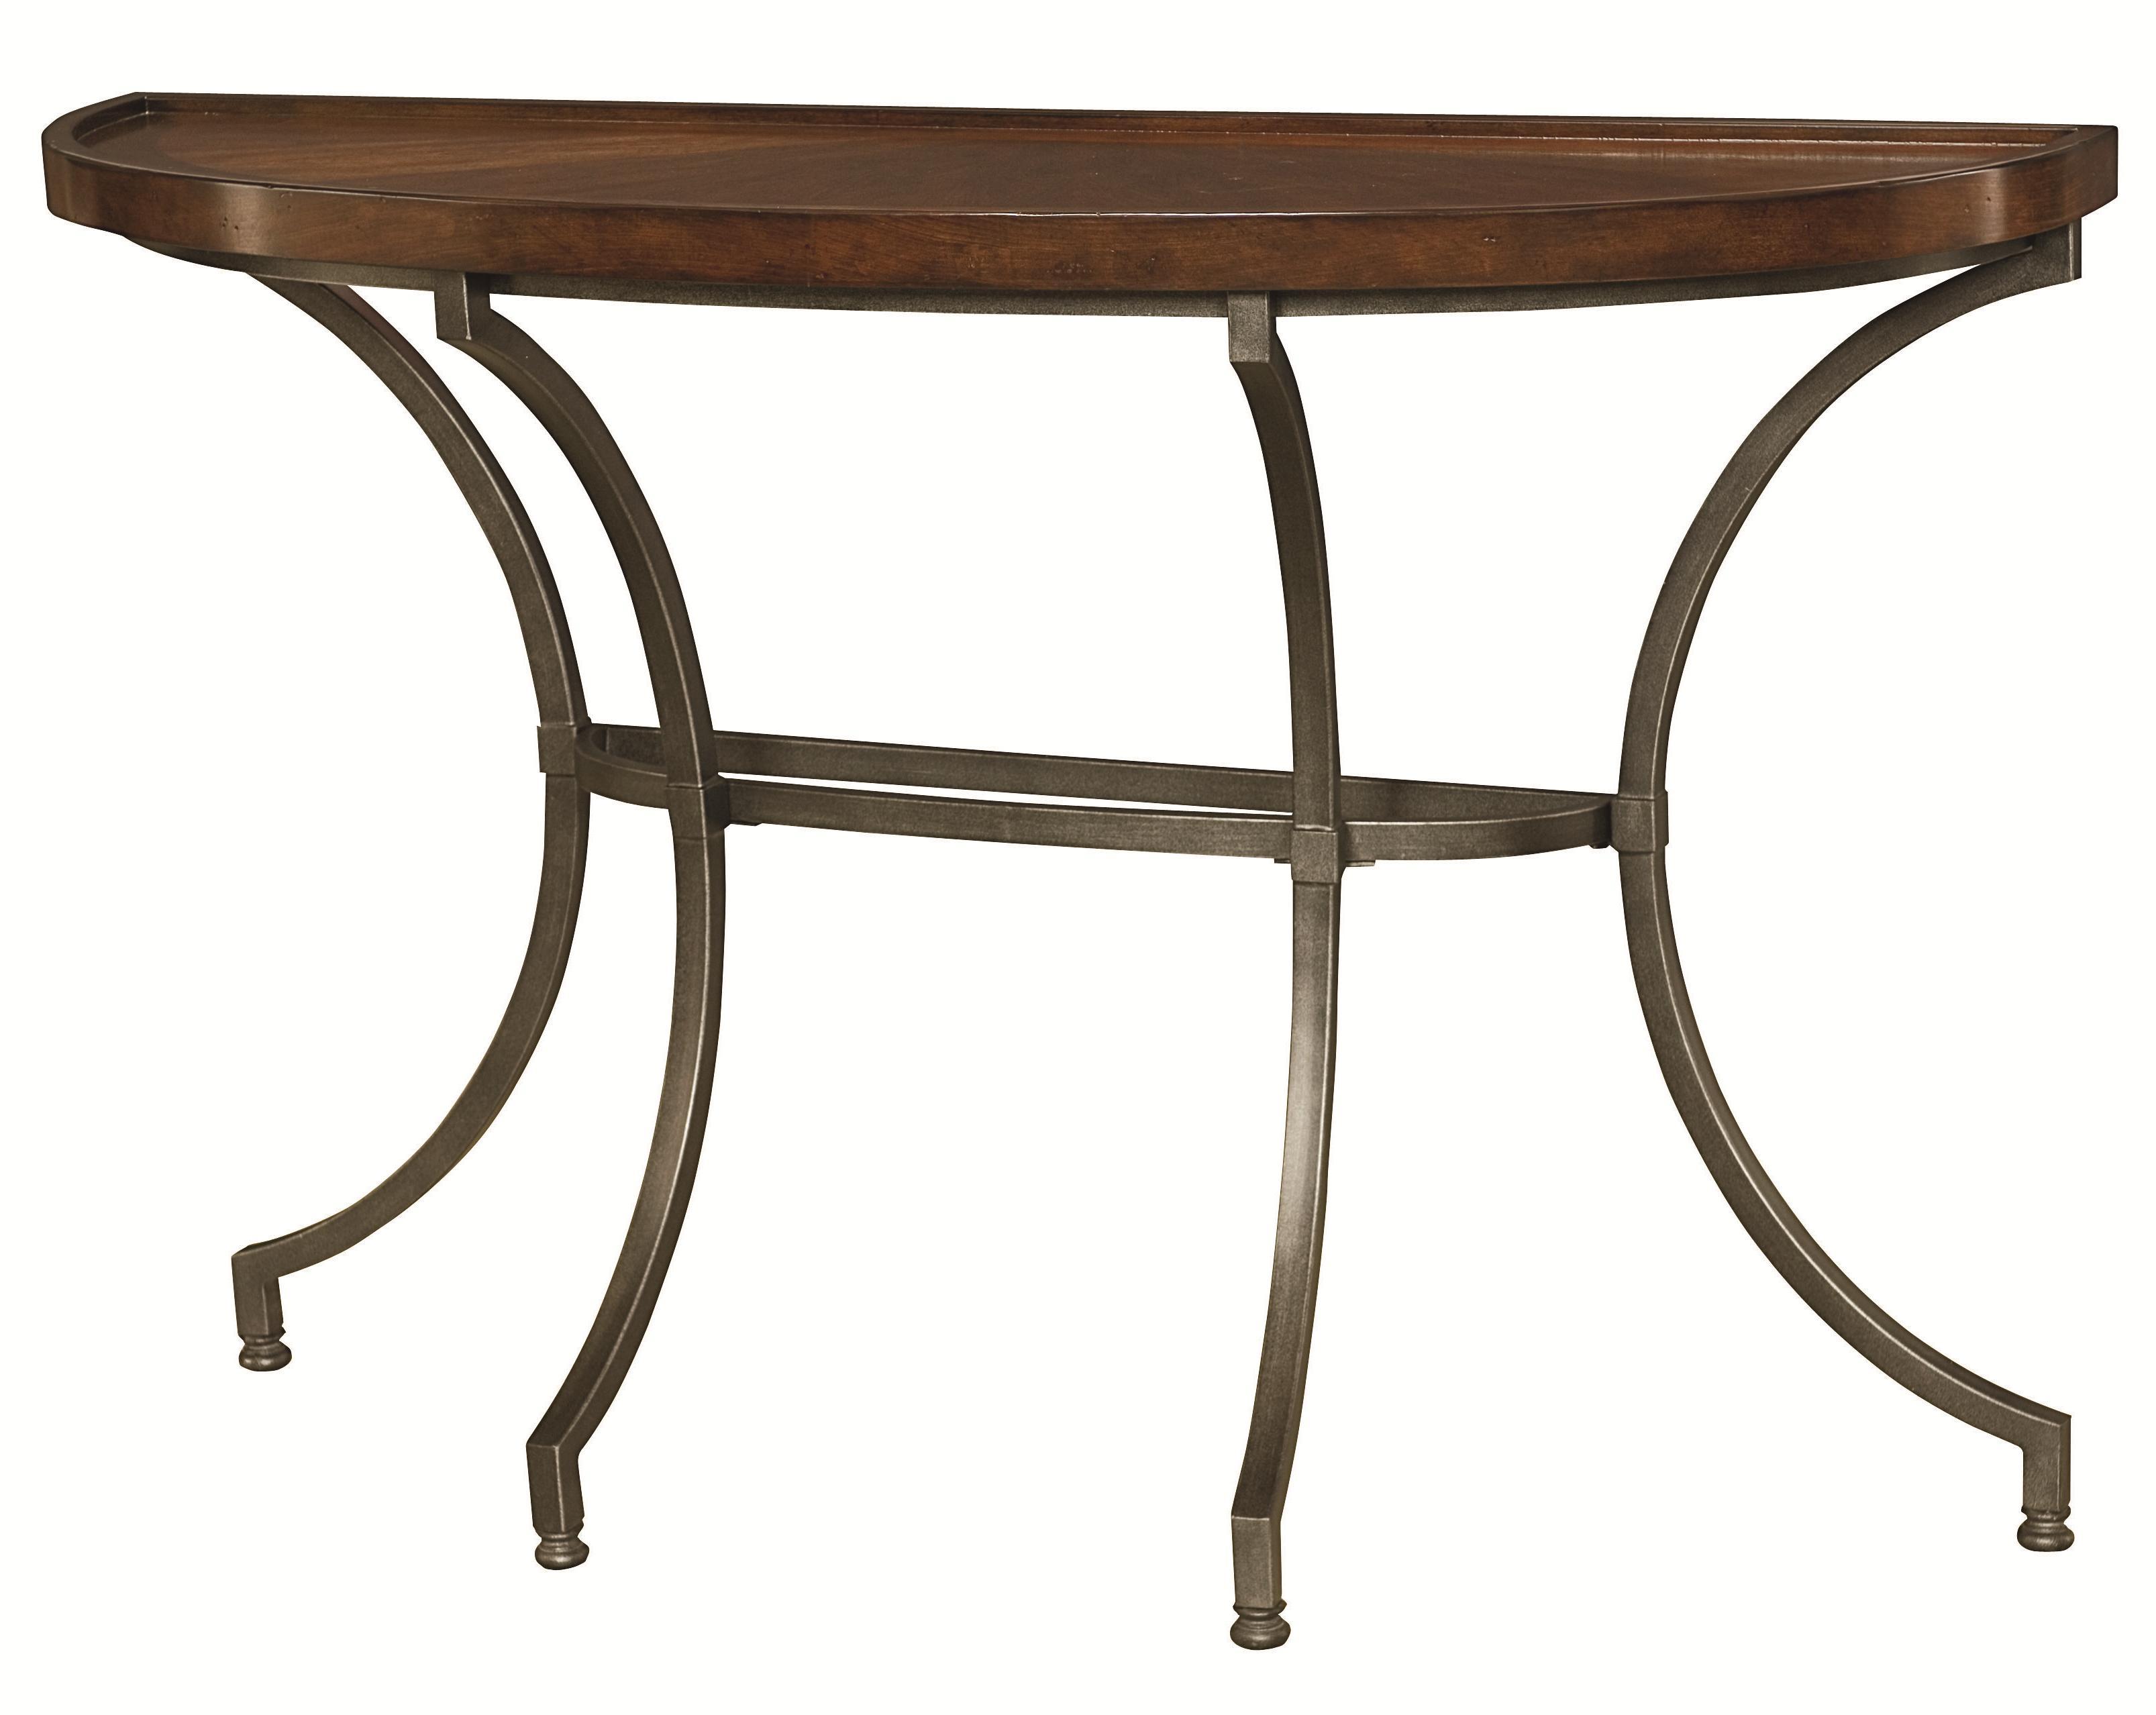 Barrow Sofa Table by Hammary at Crowley Furniture & Mattress